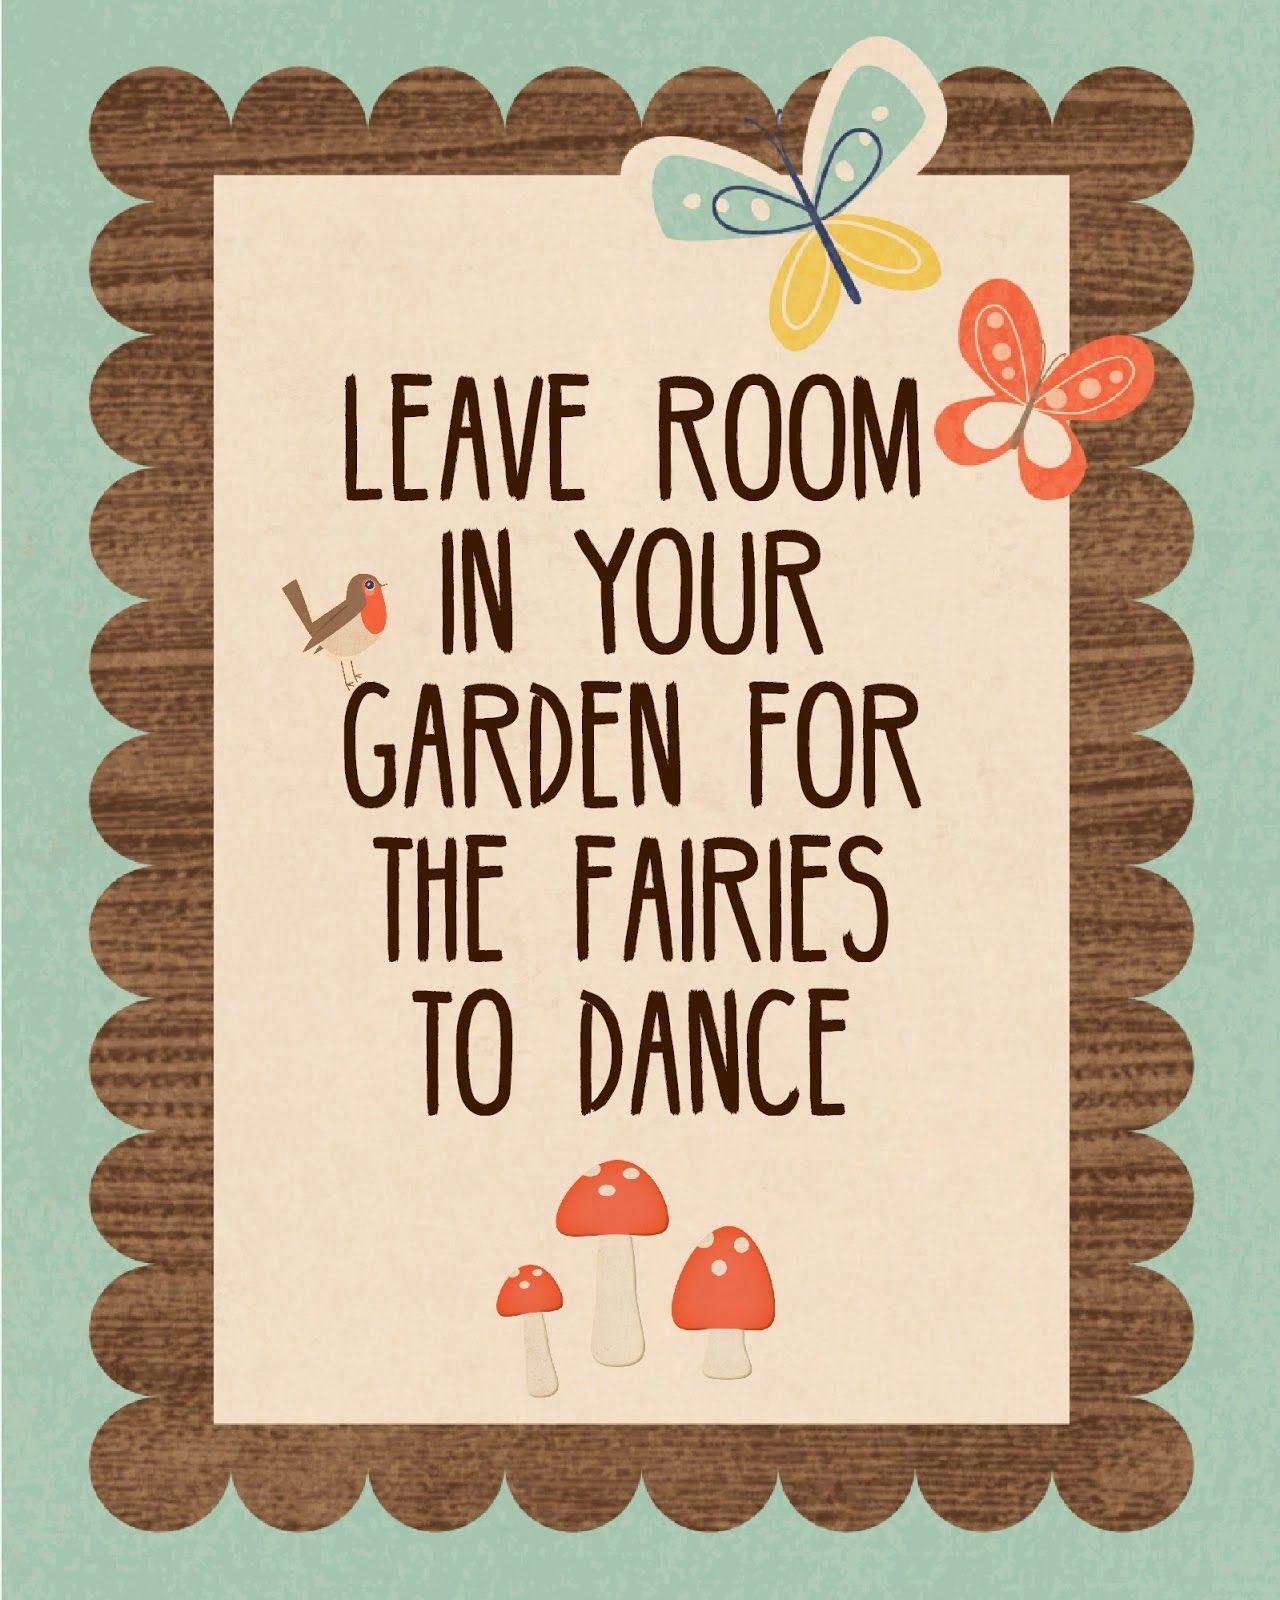 Garden Quote Garden Quotes Gardening Quotes Funny Dream Garden